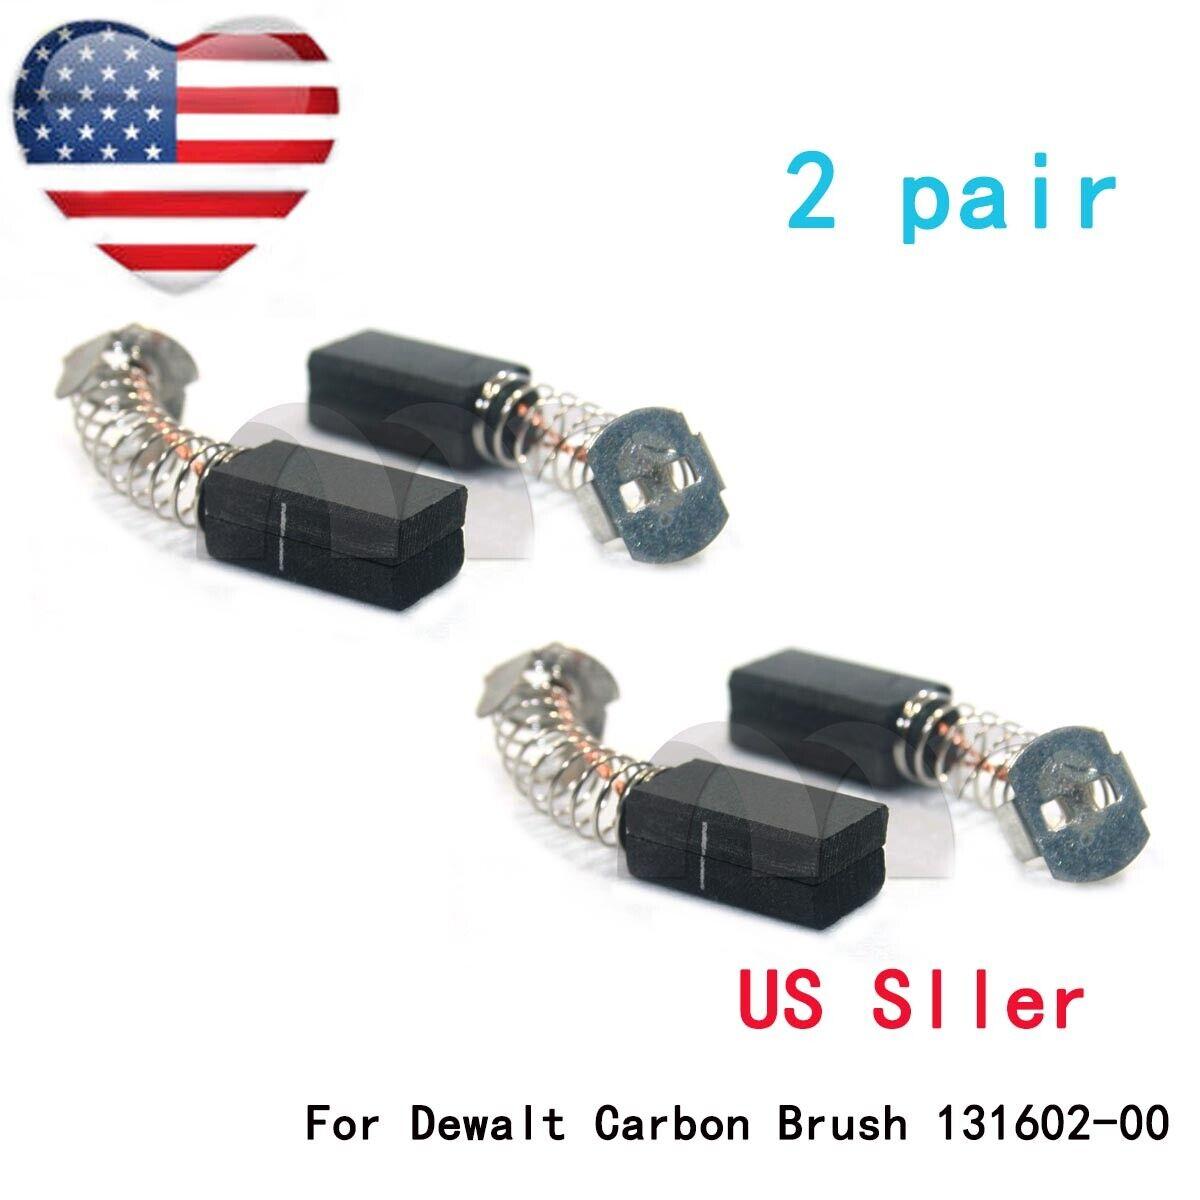 for DeWalt DW362K Type 4 Replacement Motor Carbon Brushes 1 pair